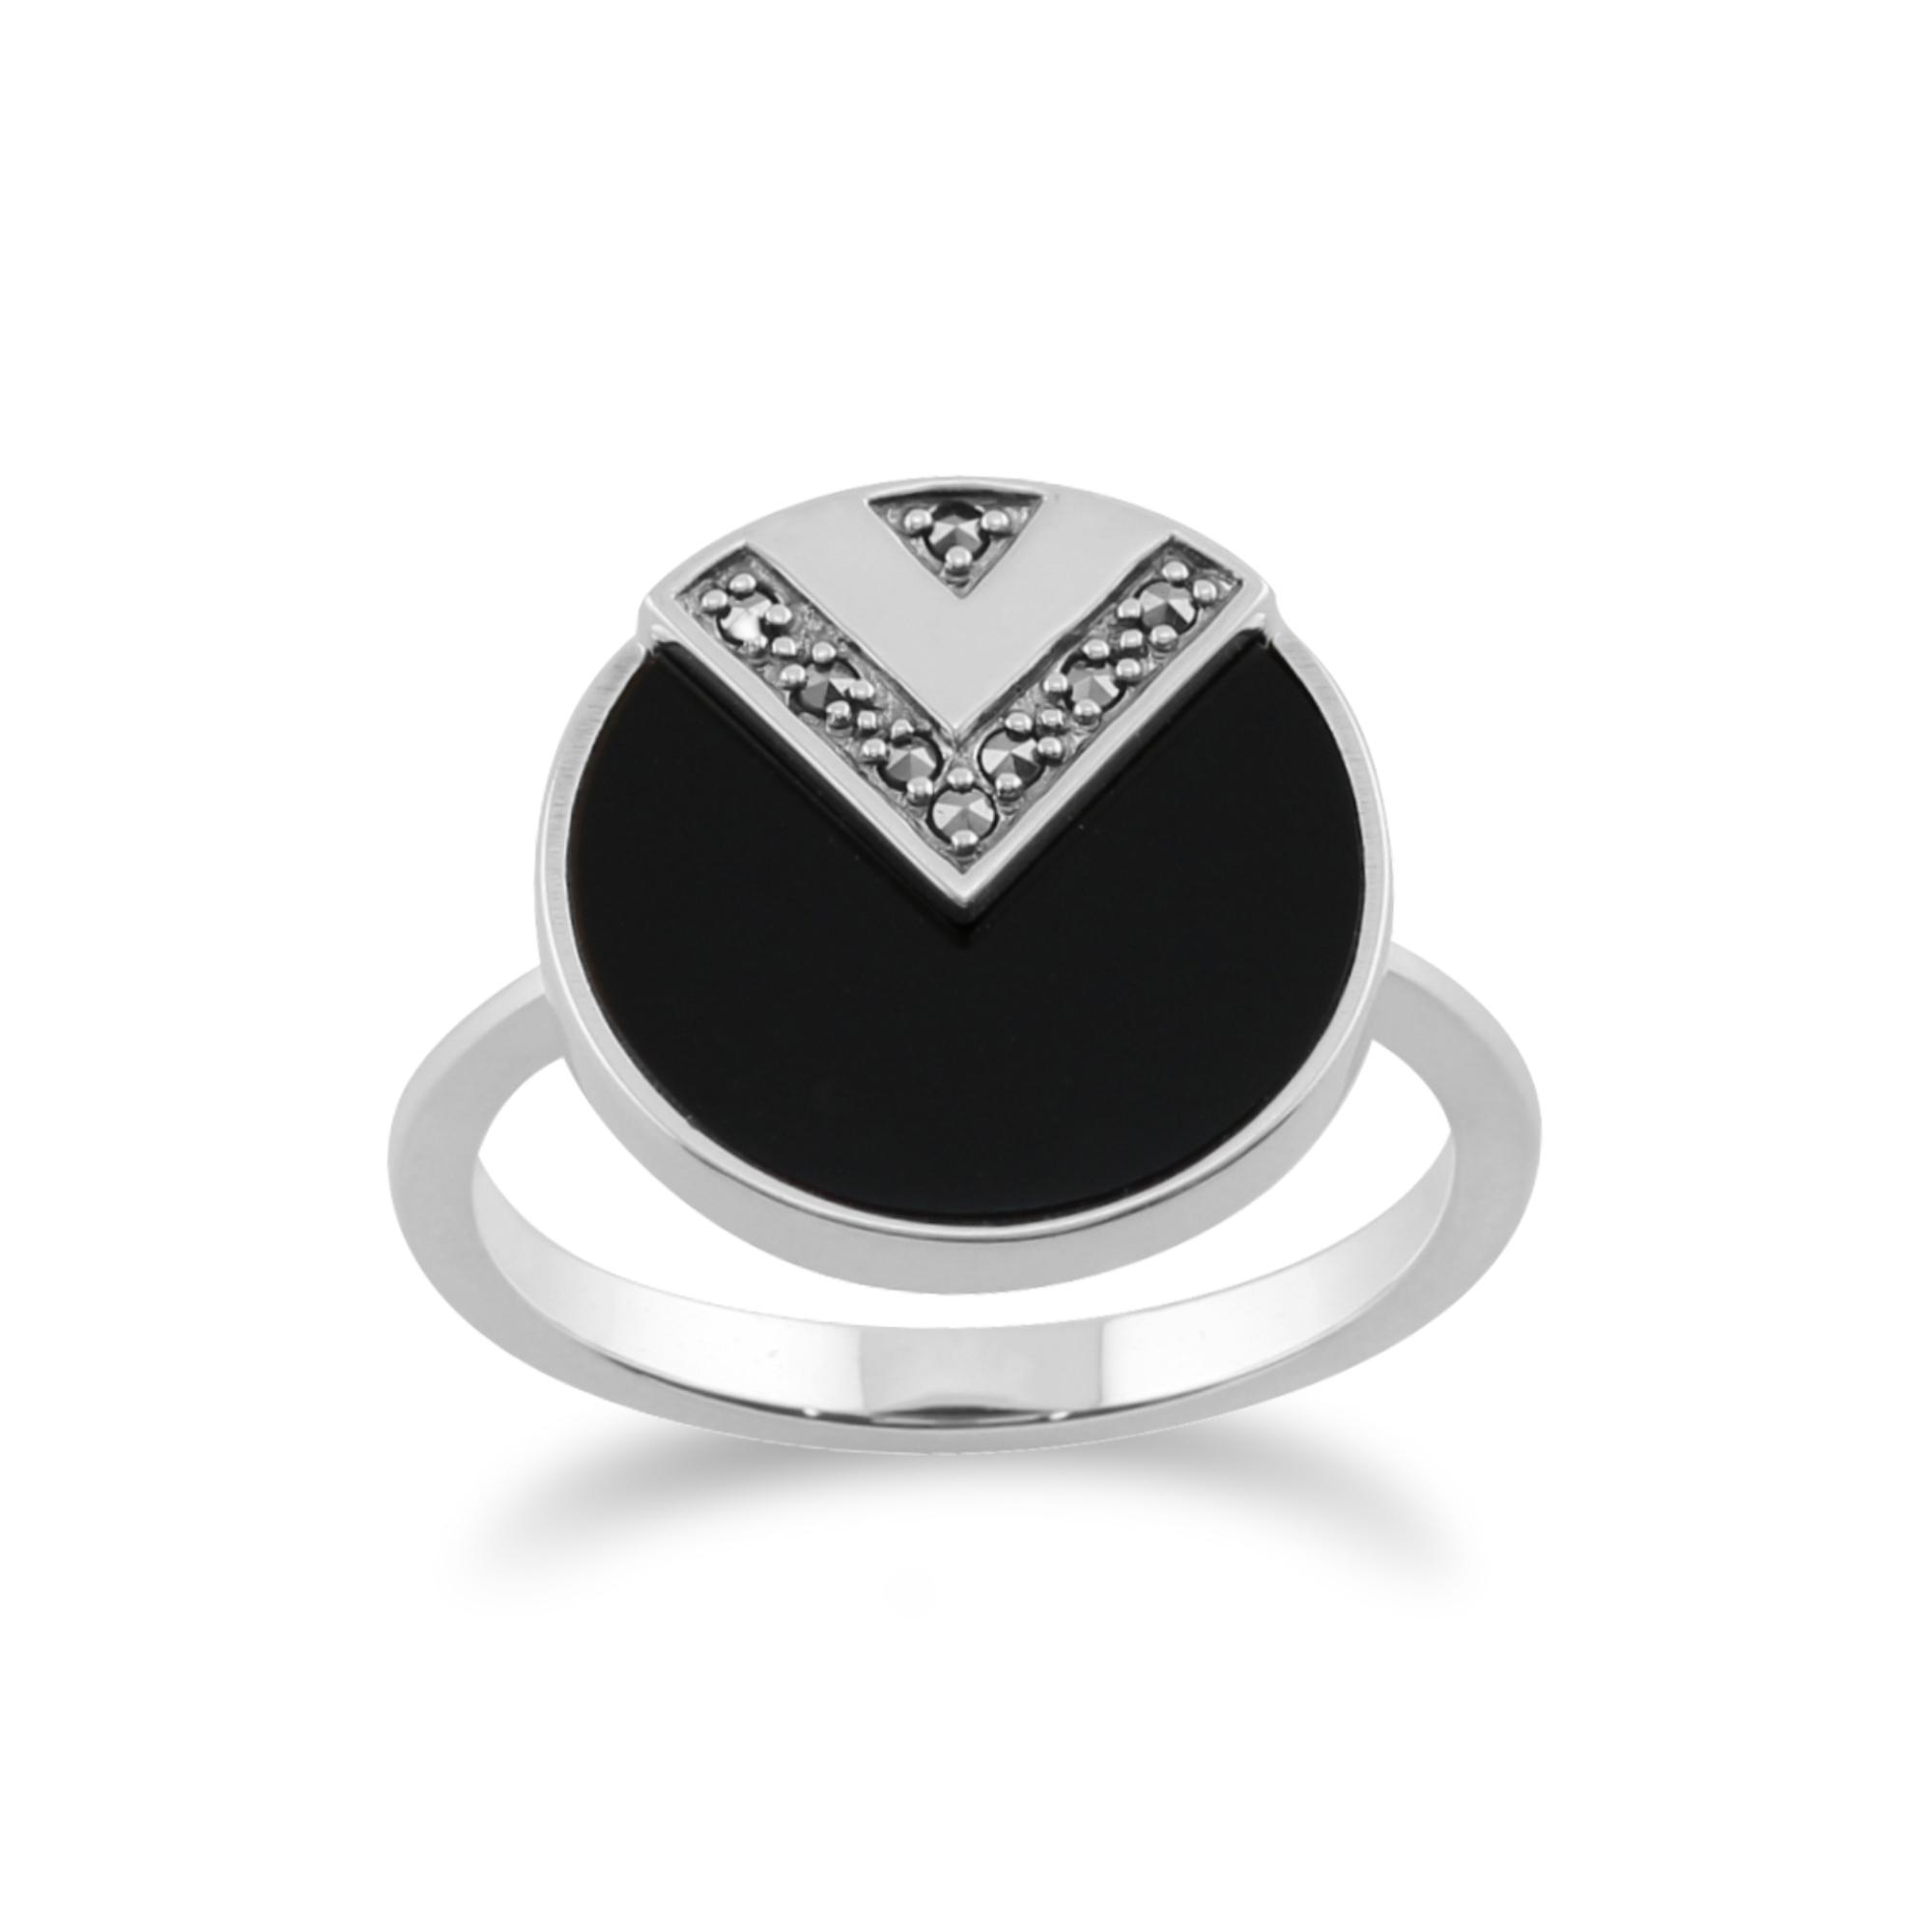 Gemondo 925 Sterling Silver 3ct Black Onyx & Marcasite Art Deco Ring